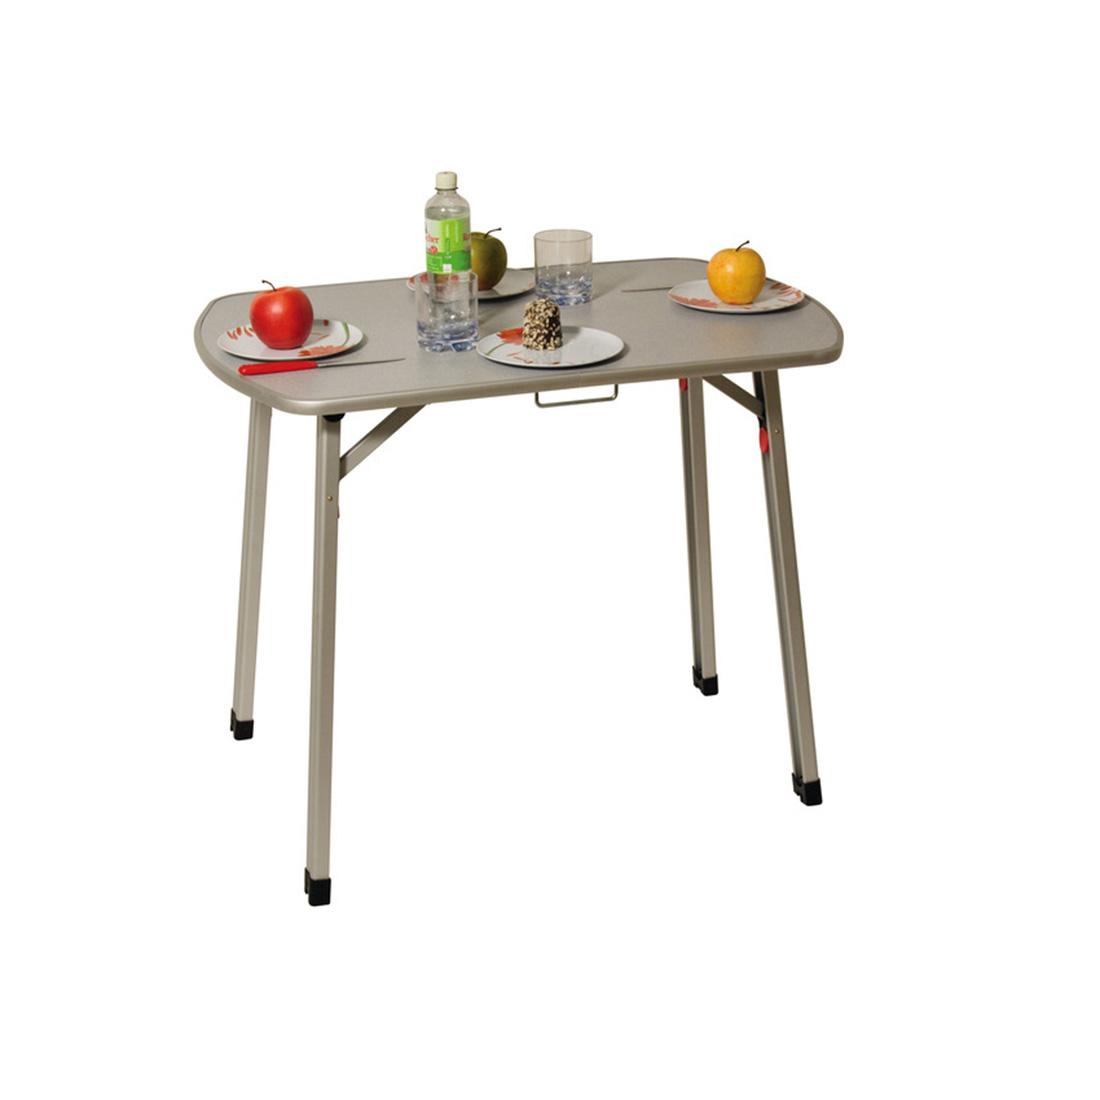 Motorhome camper folding table.